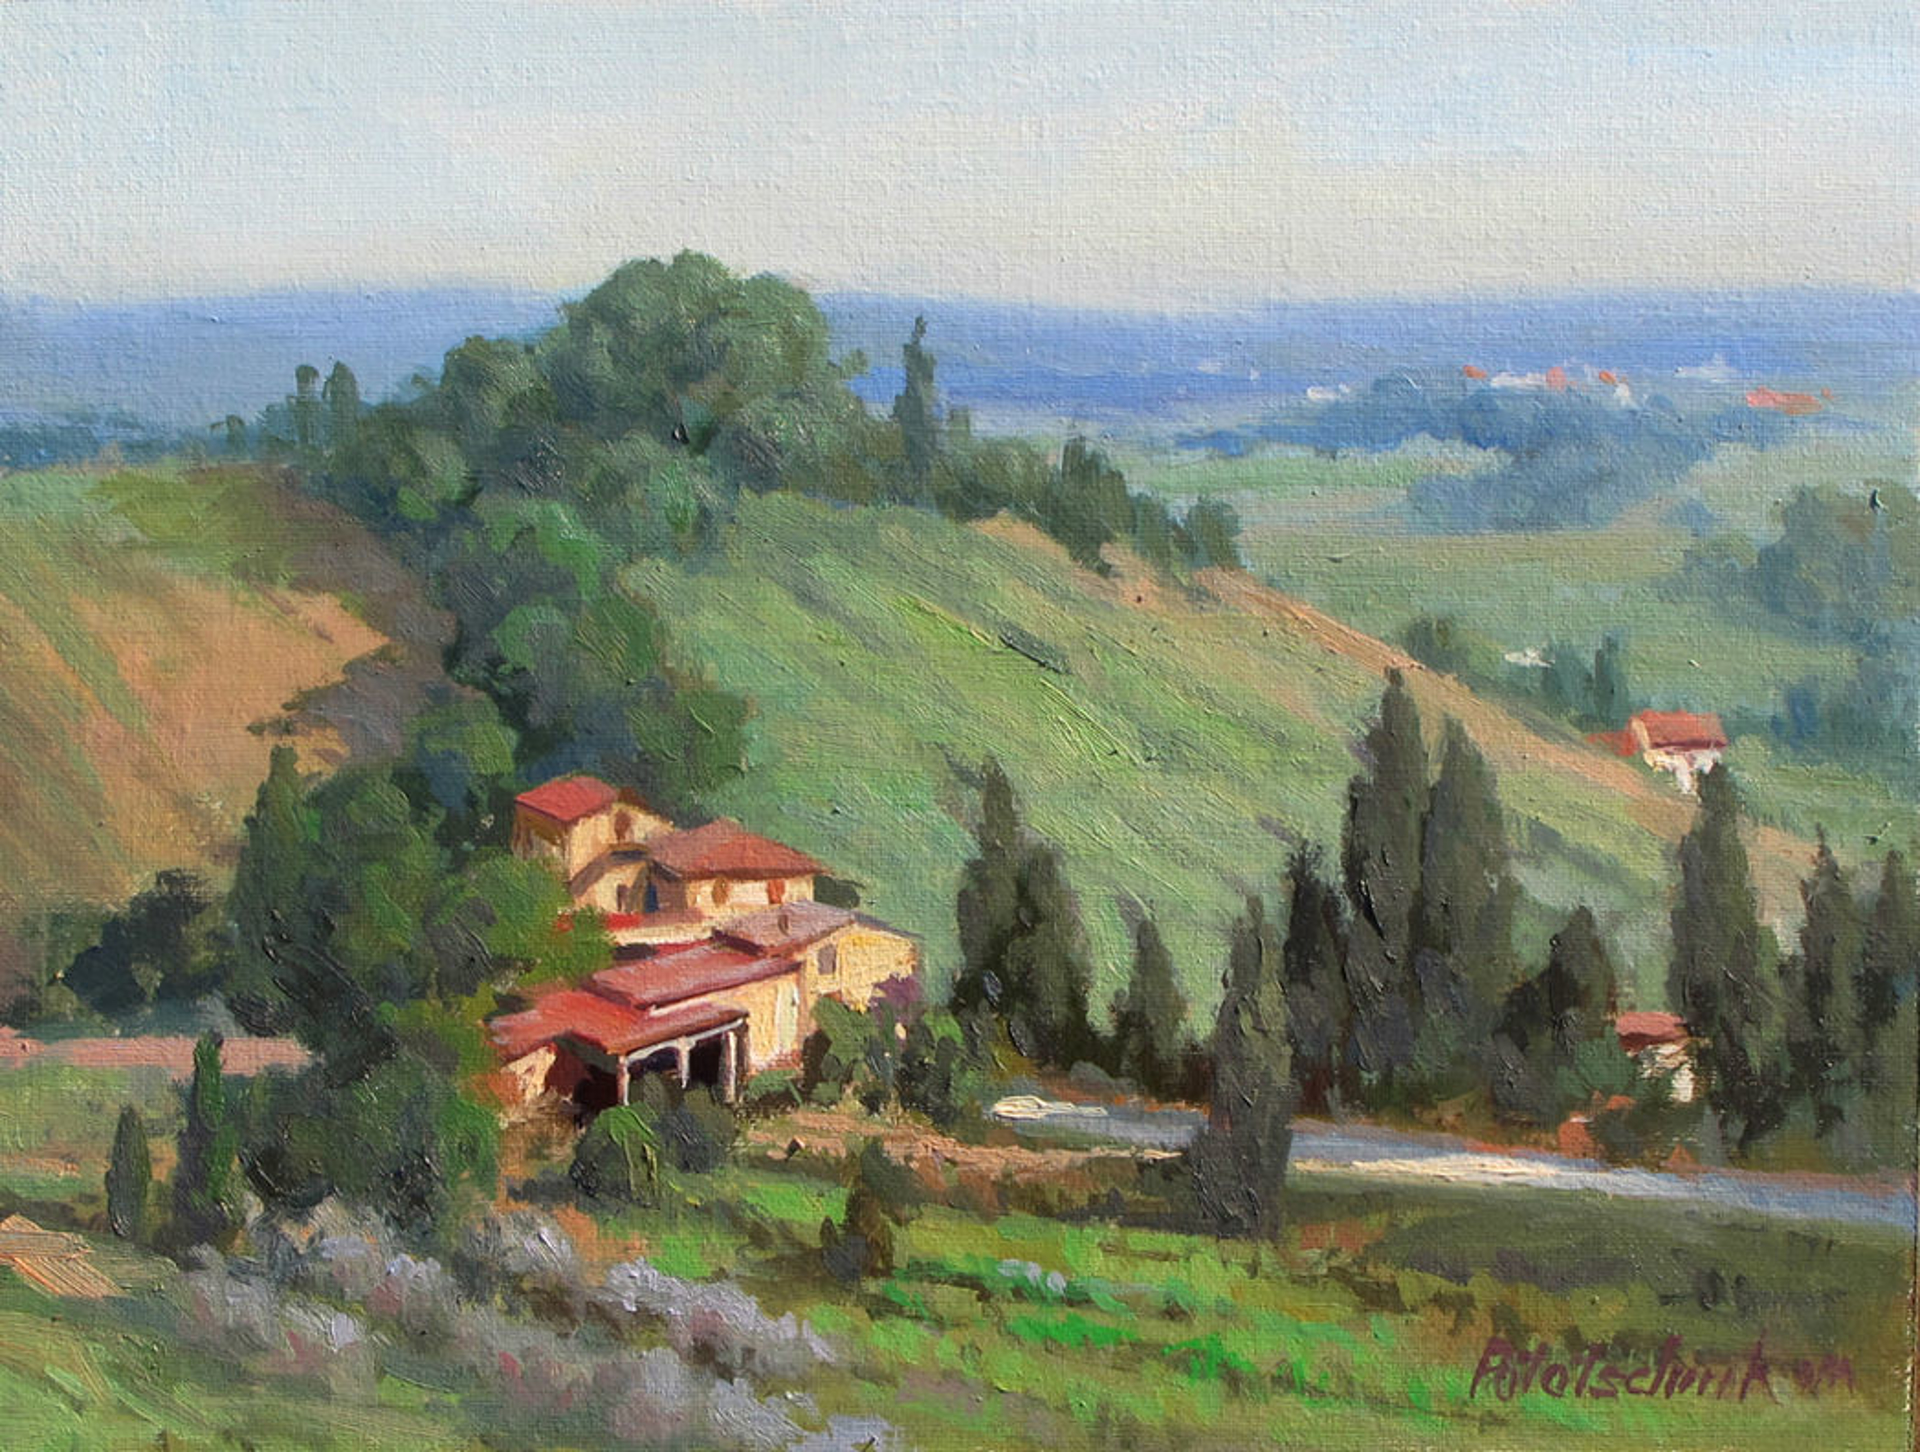 Rural Italy by John Pototschnik